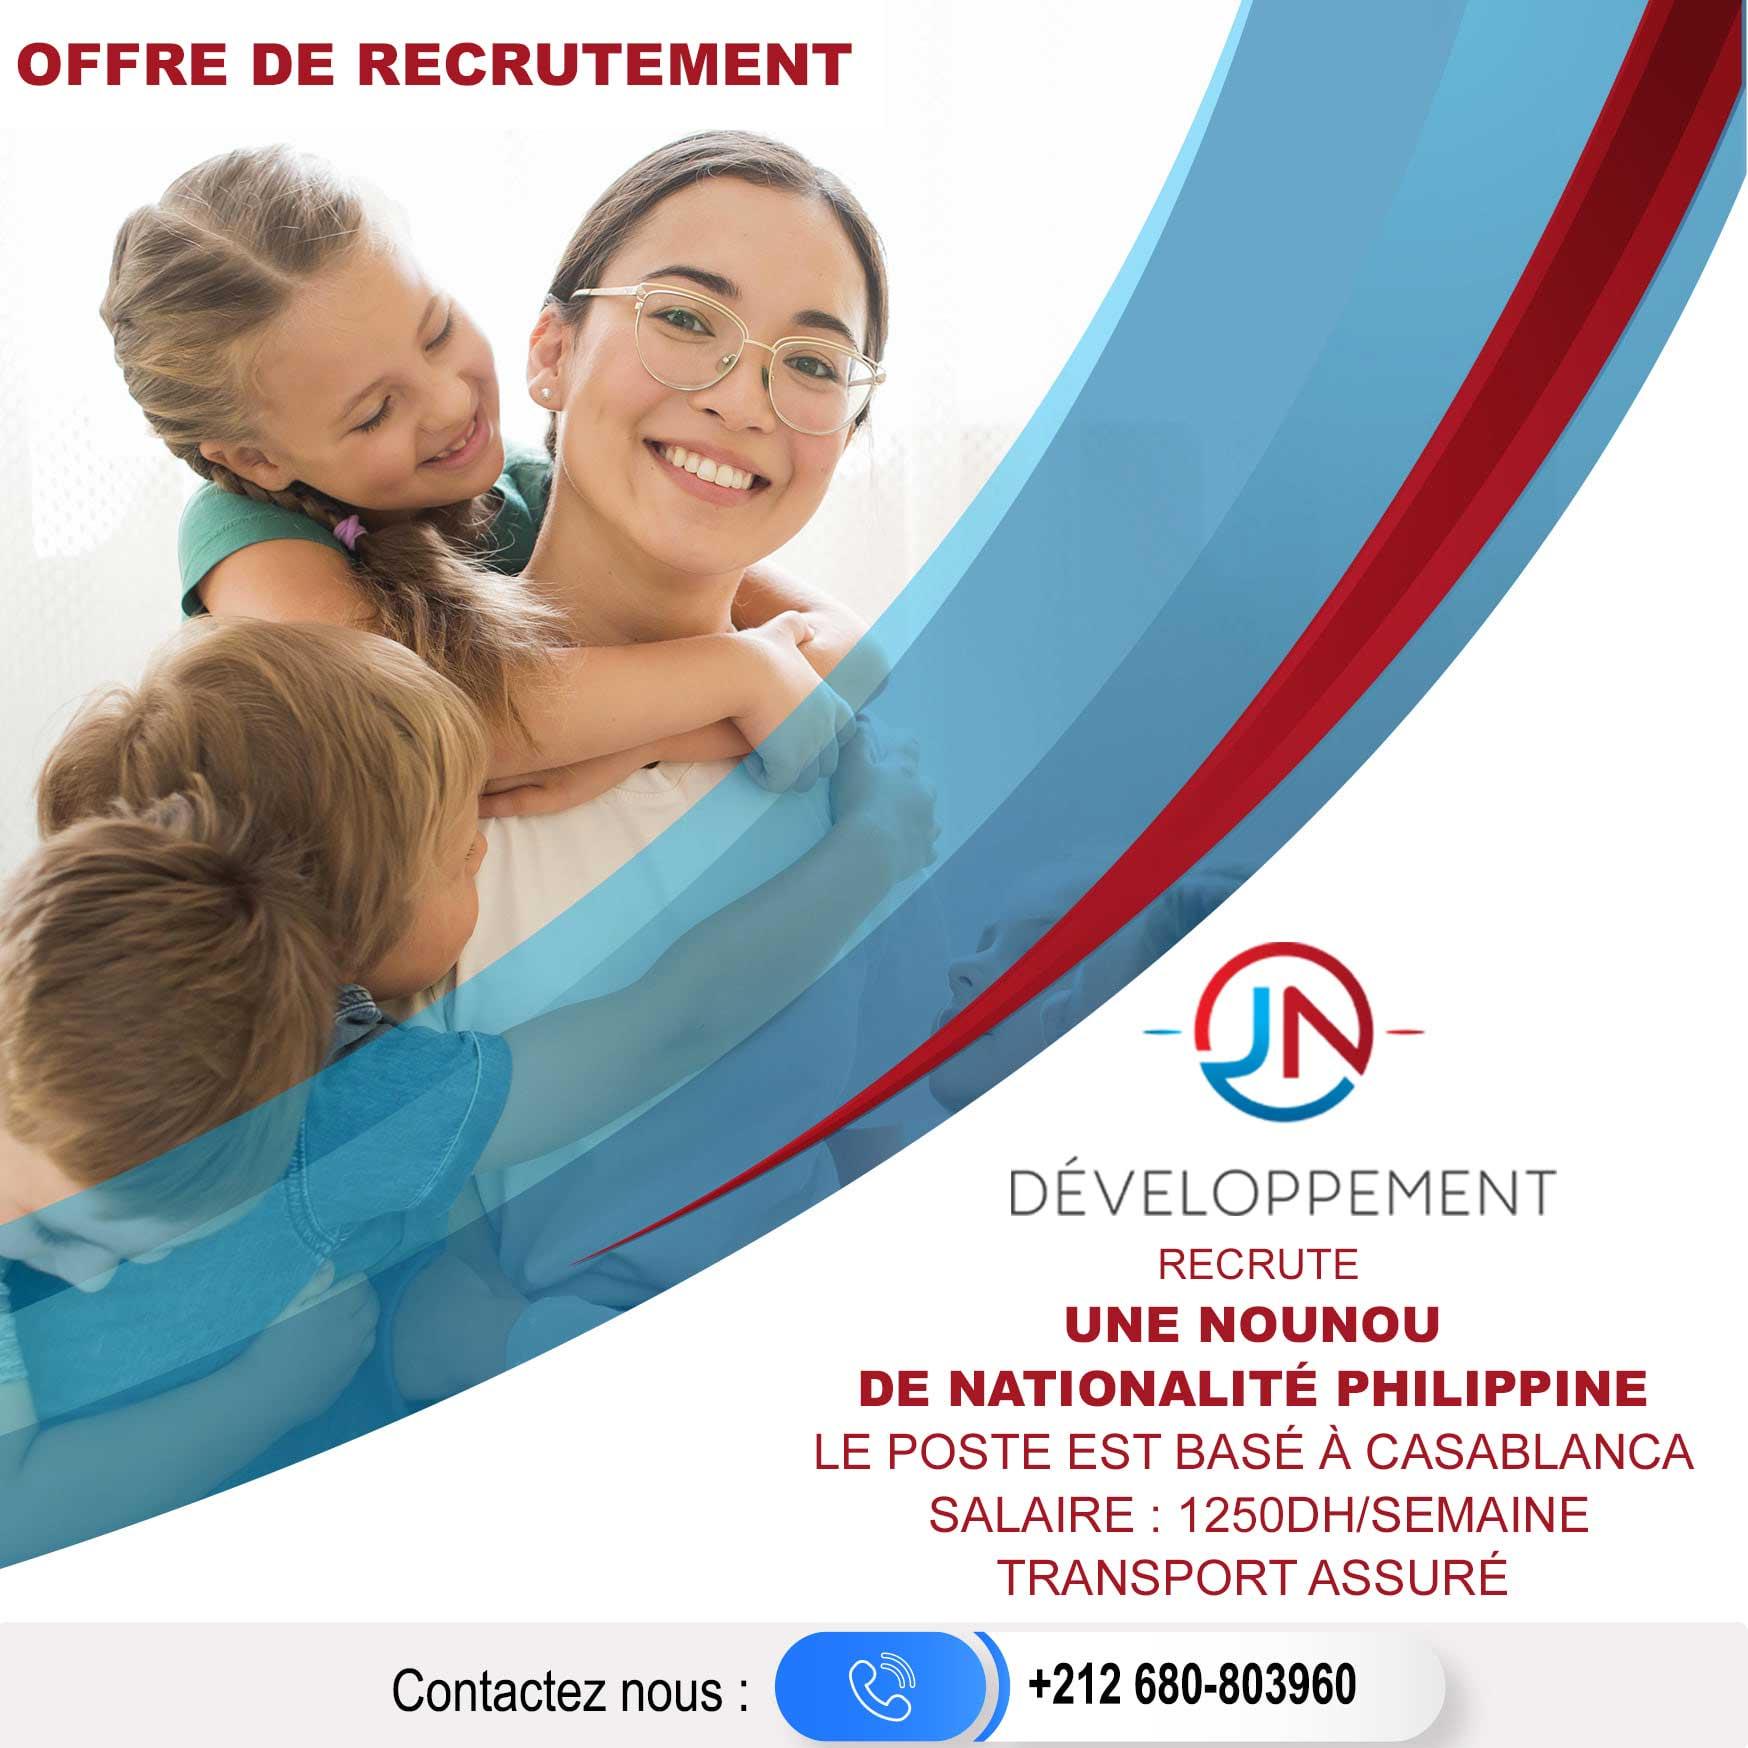 offre-nounou-phili1-leger